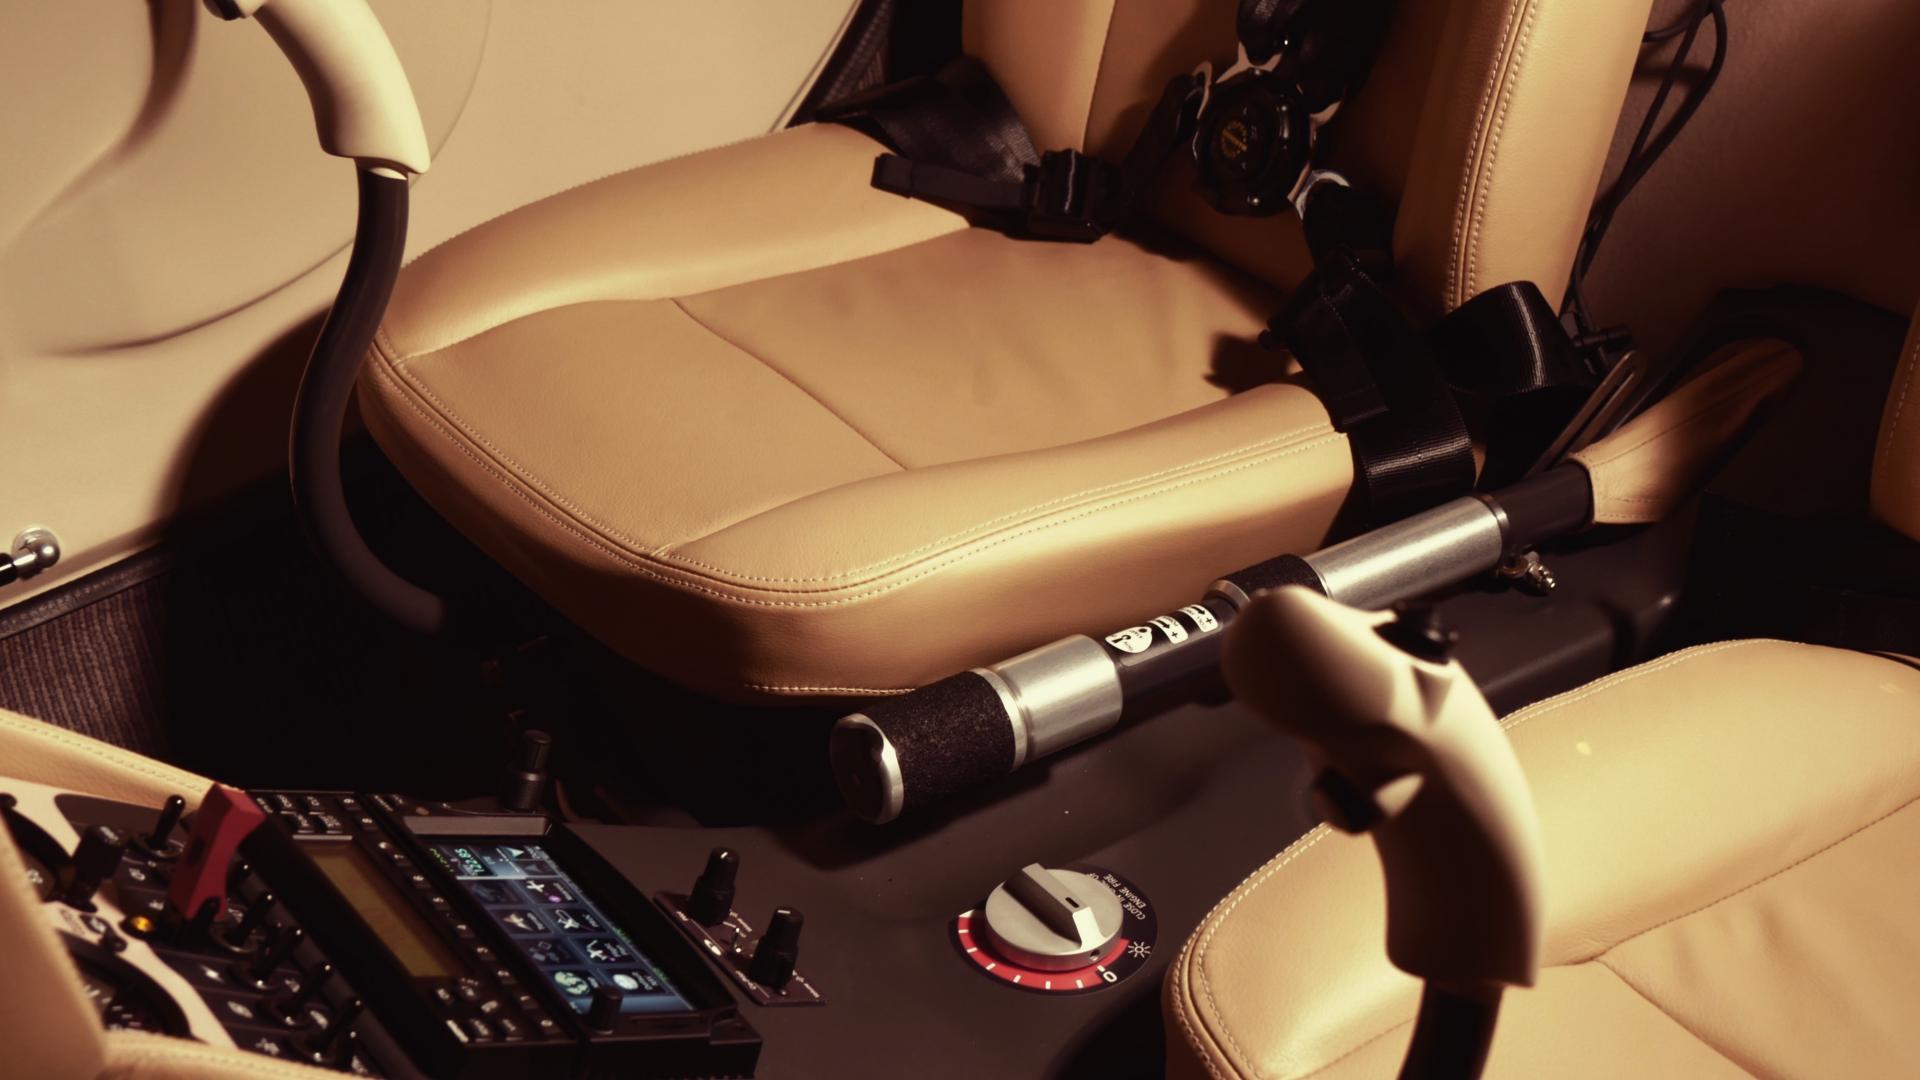 Confort de pilotage - Cabri g2